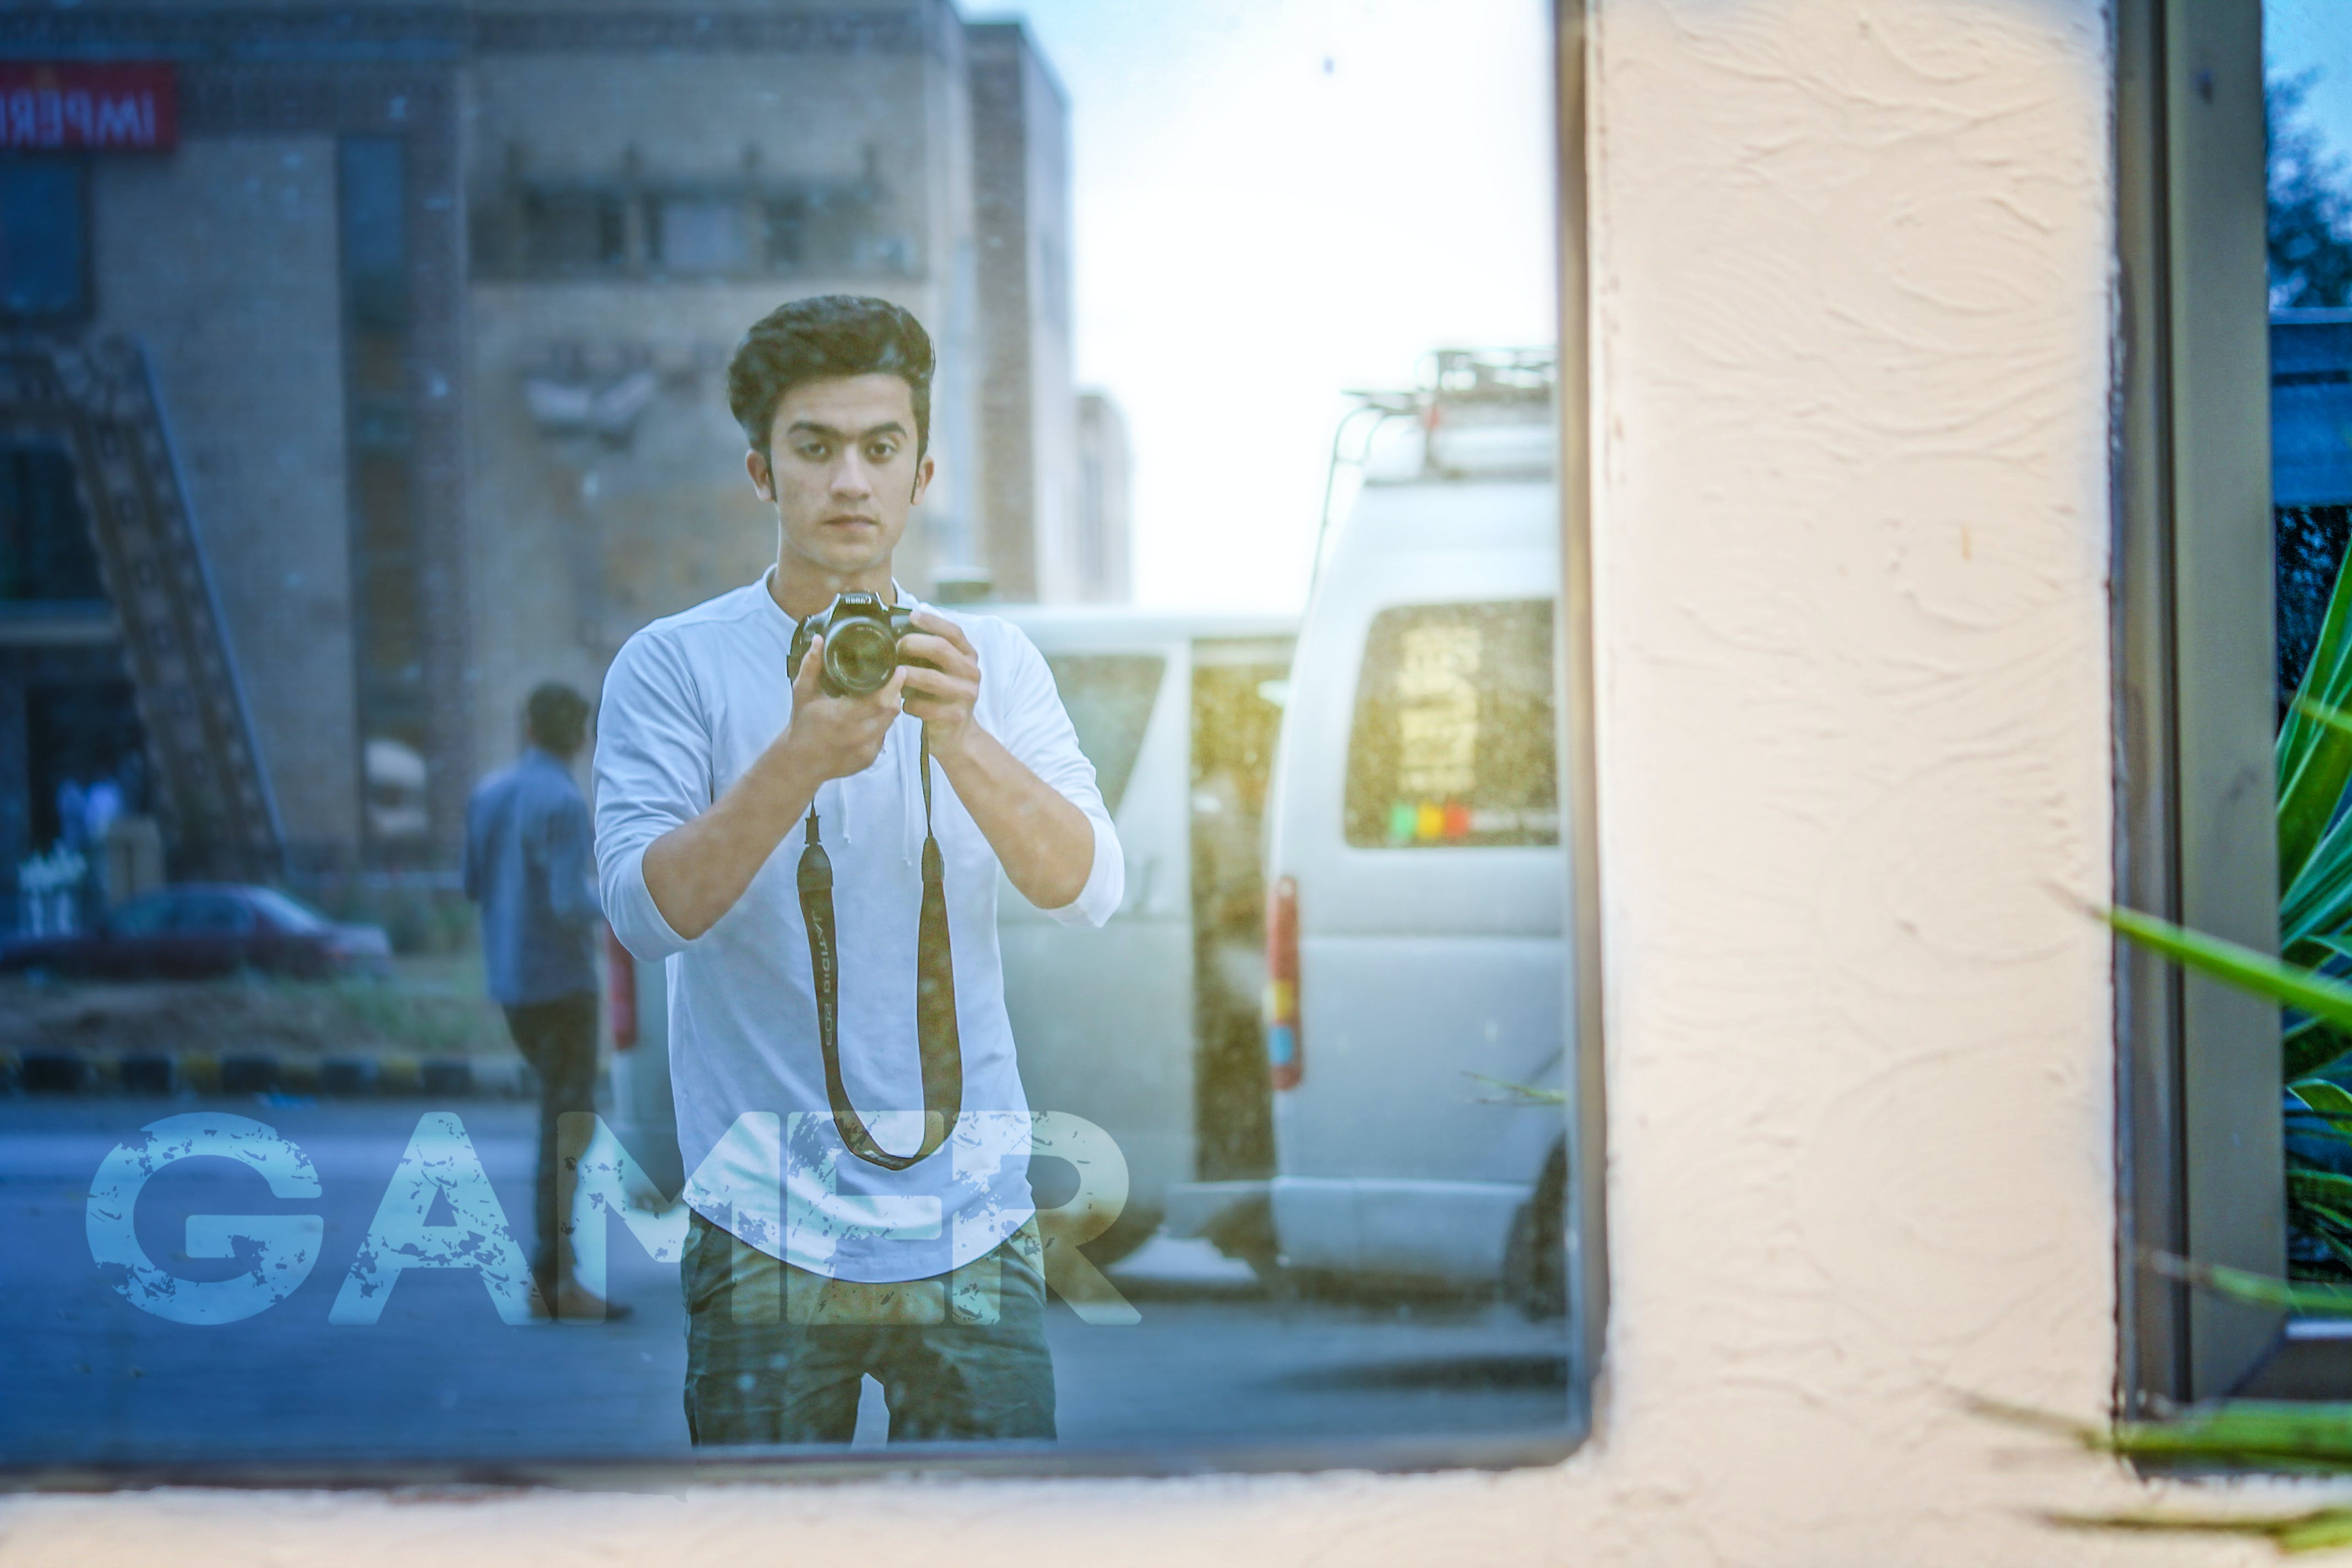 Man Wearing White Shirt And Holding Camera